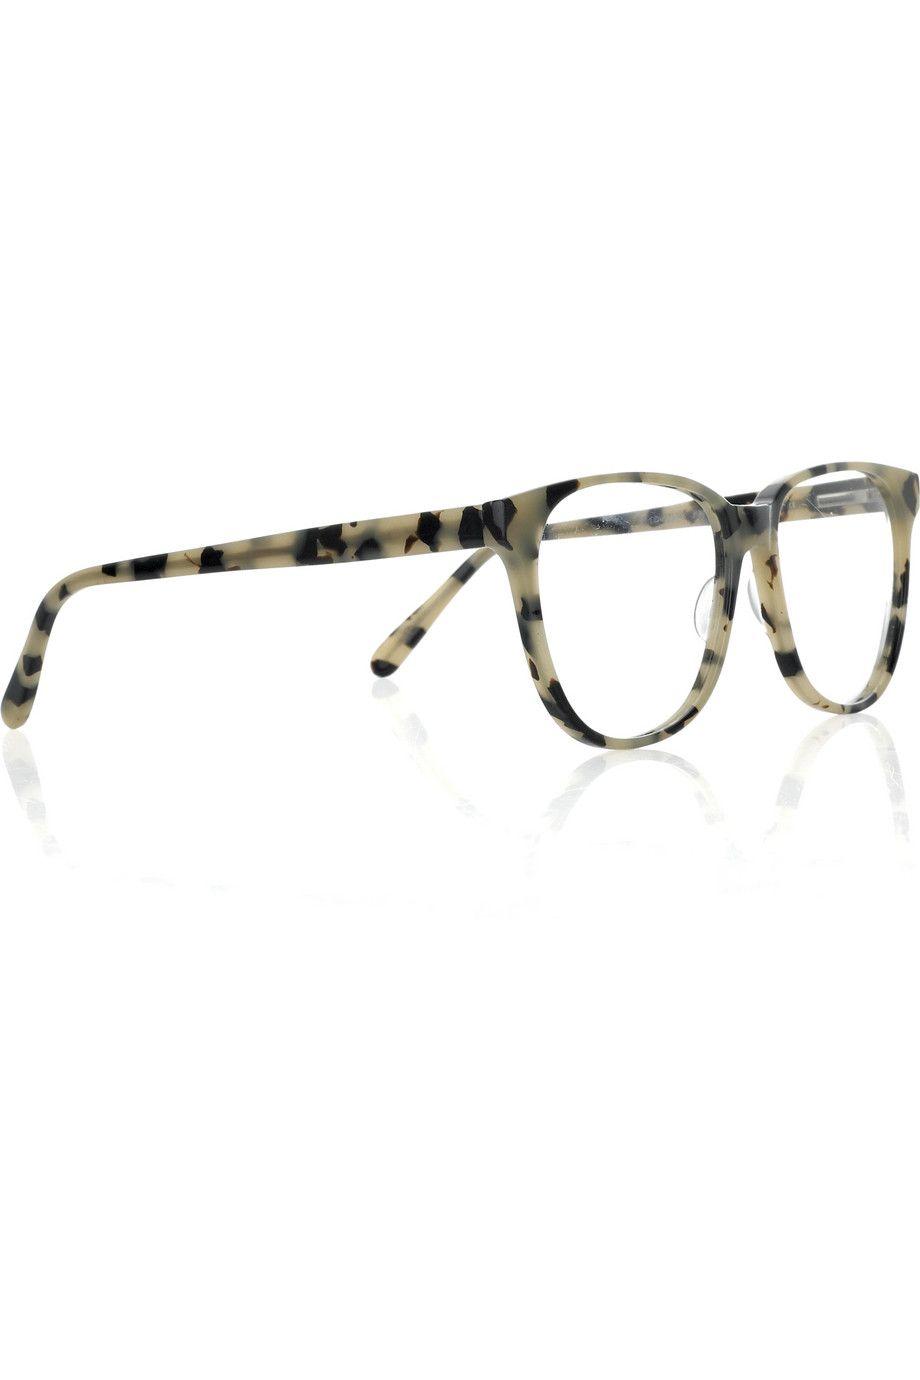 Prism\'s tortoiseshell acetate D-frame optical glasses | Sun Shy ...